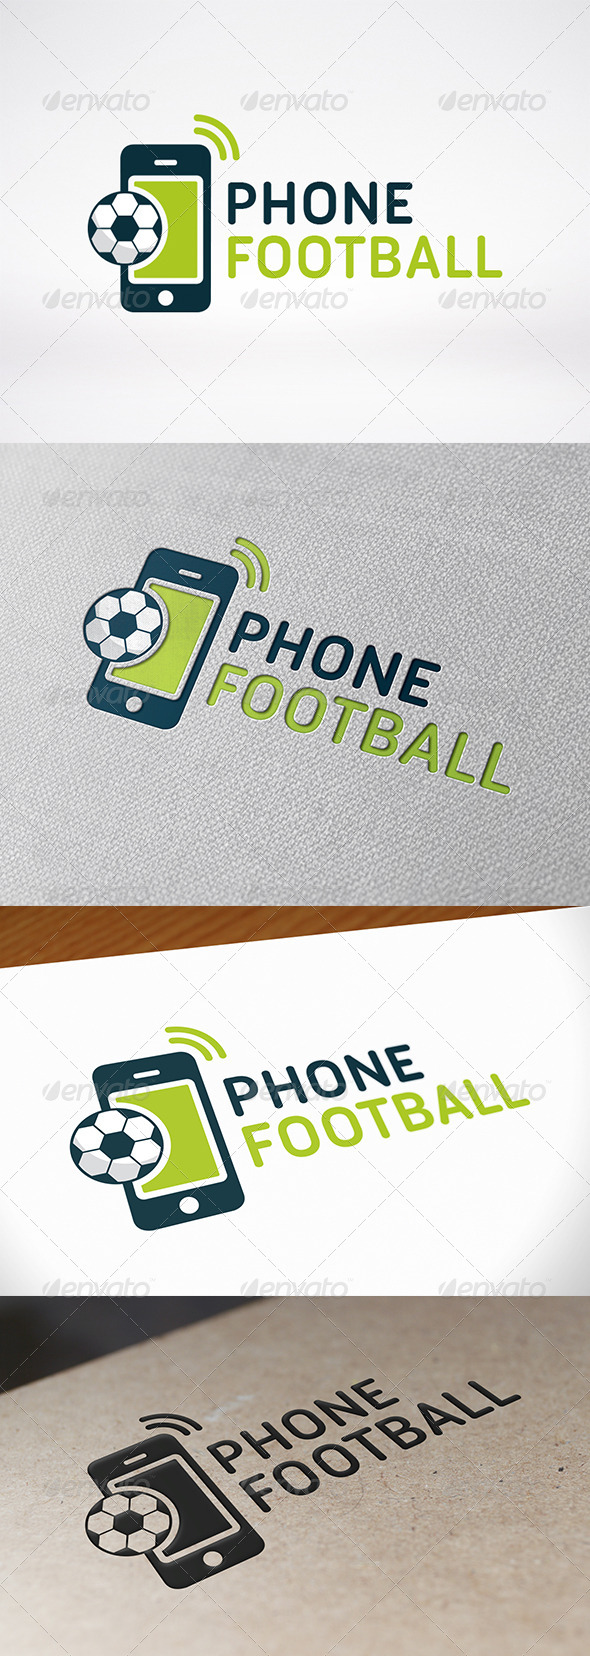 Football Phone Logo Template